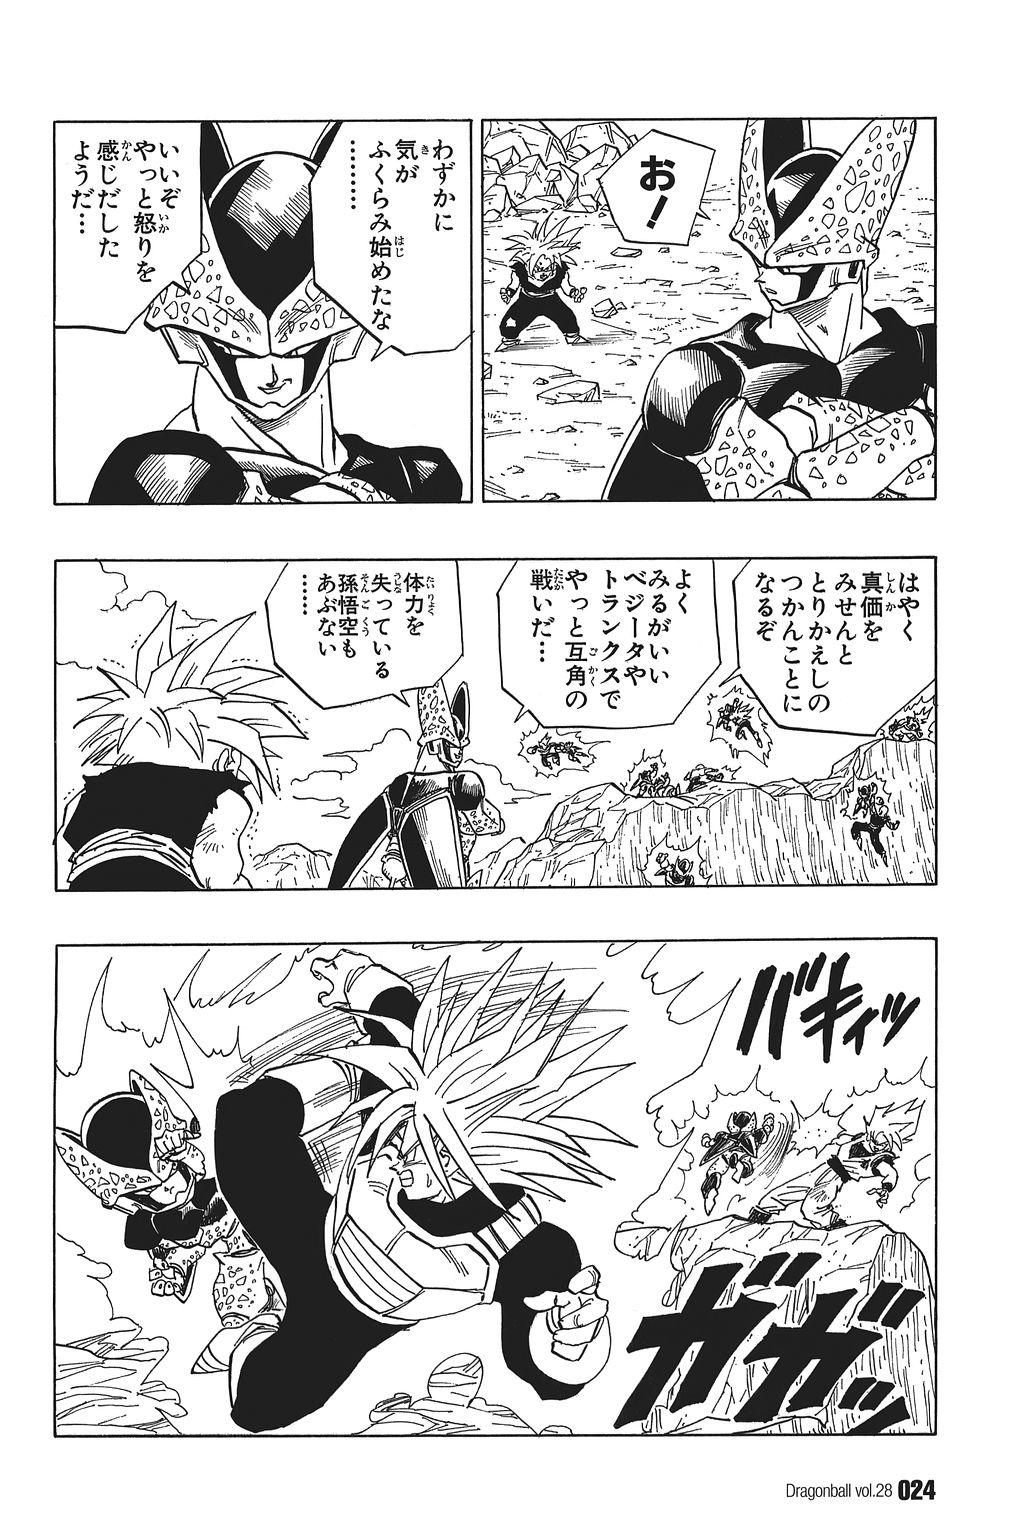 Piccolo Tired Mssj Goku Vs Cell Jr Page 3 Dbzeta Dbz Forum